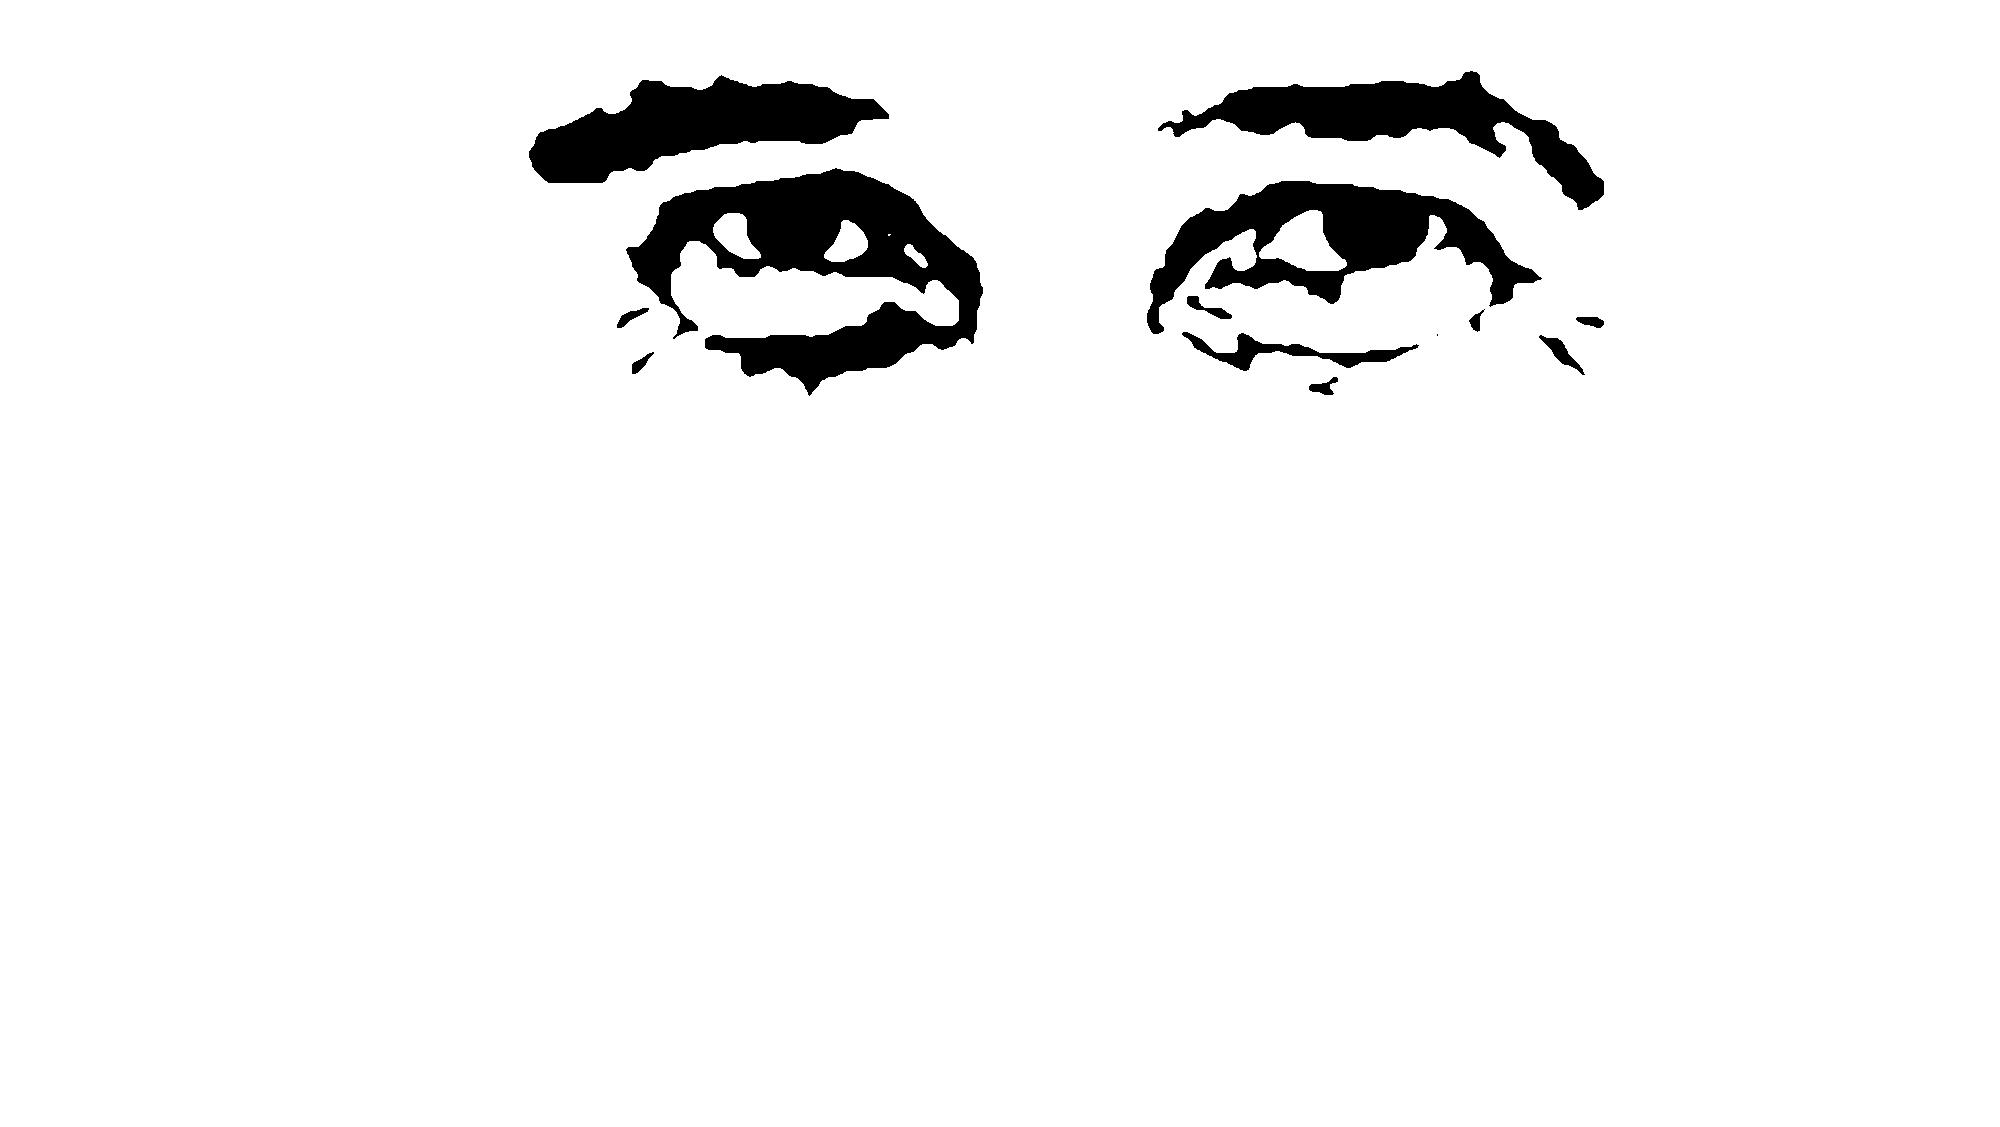 visual-language/img/illich-eyes.png